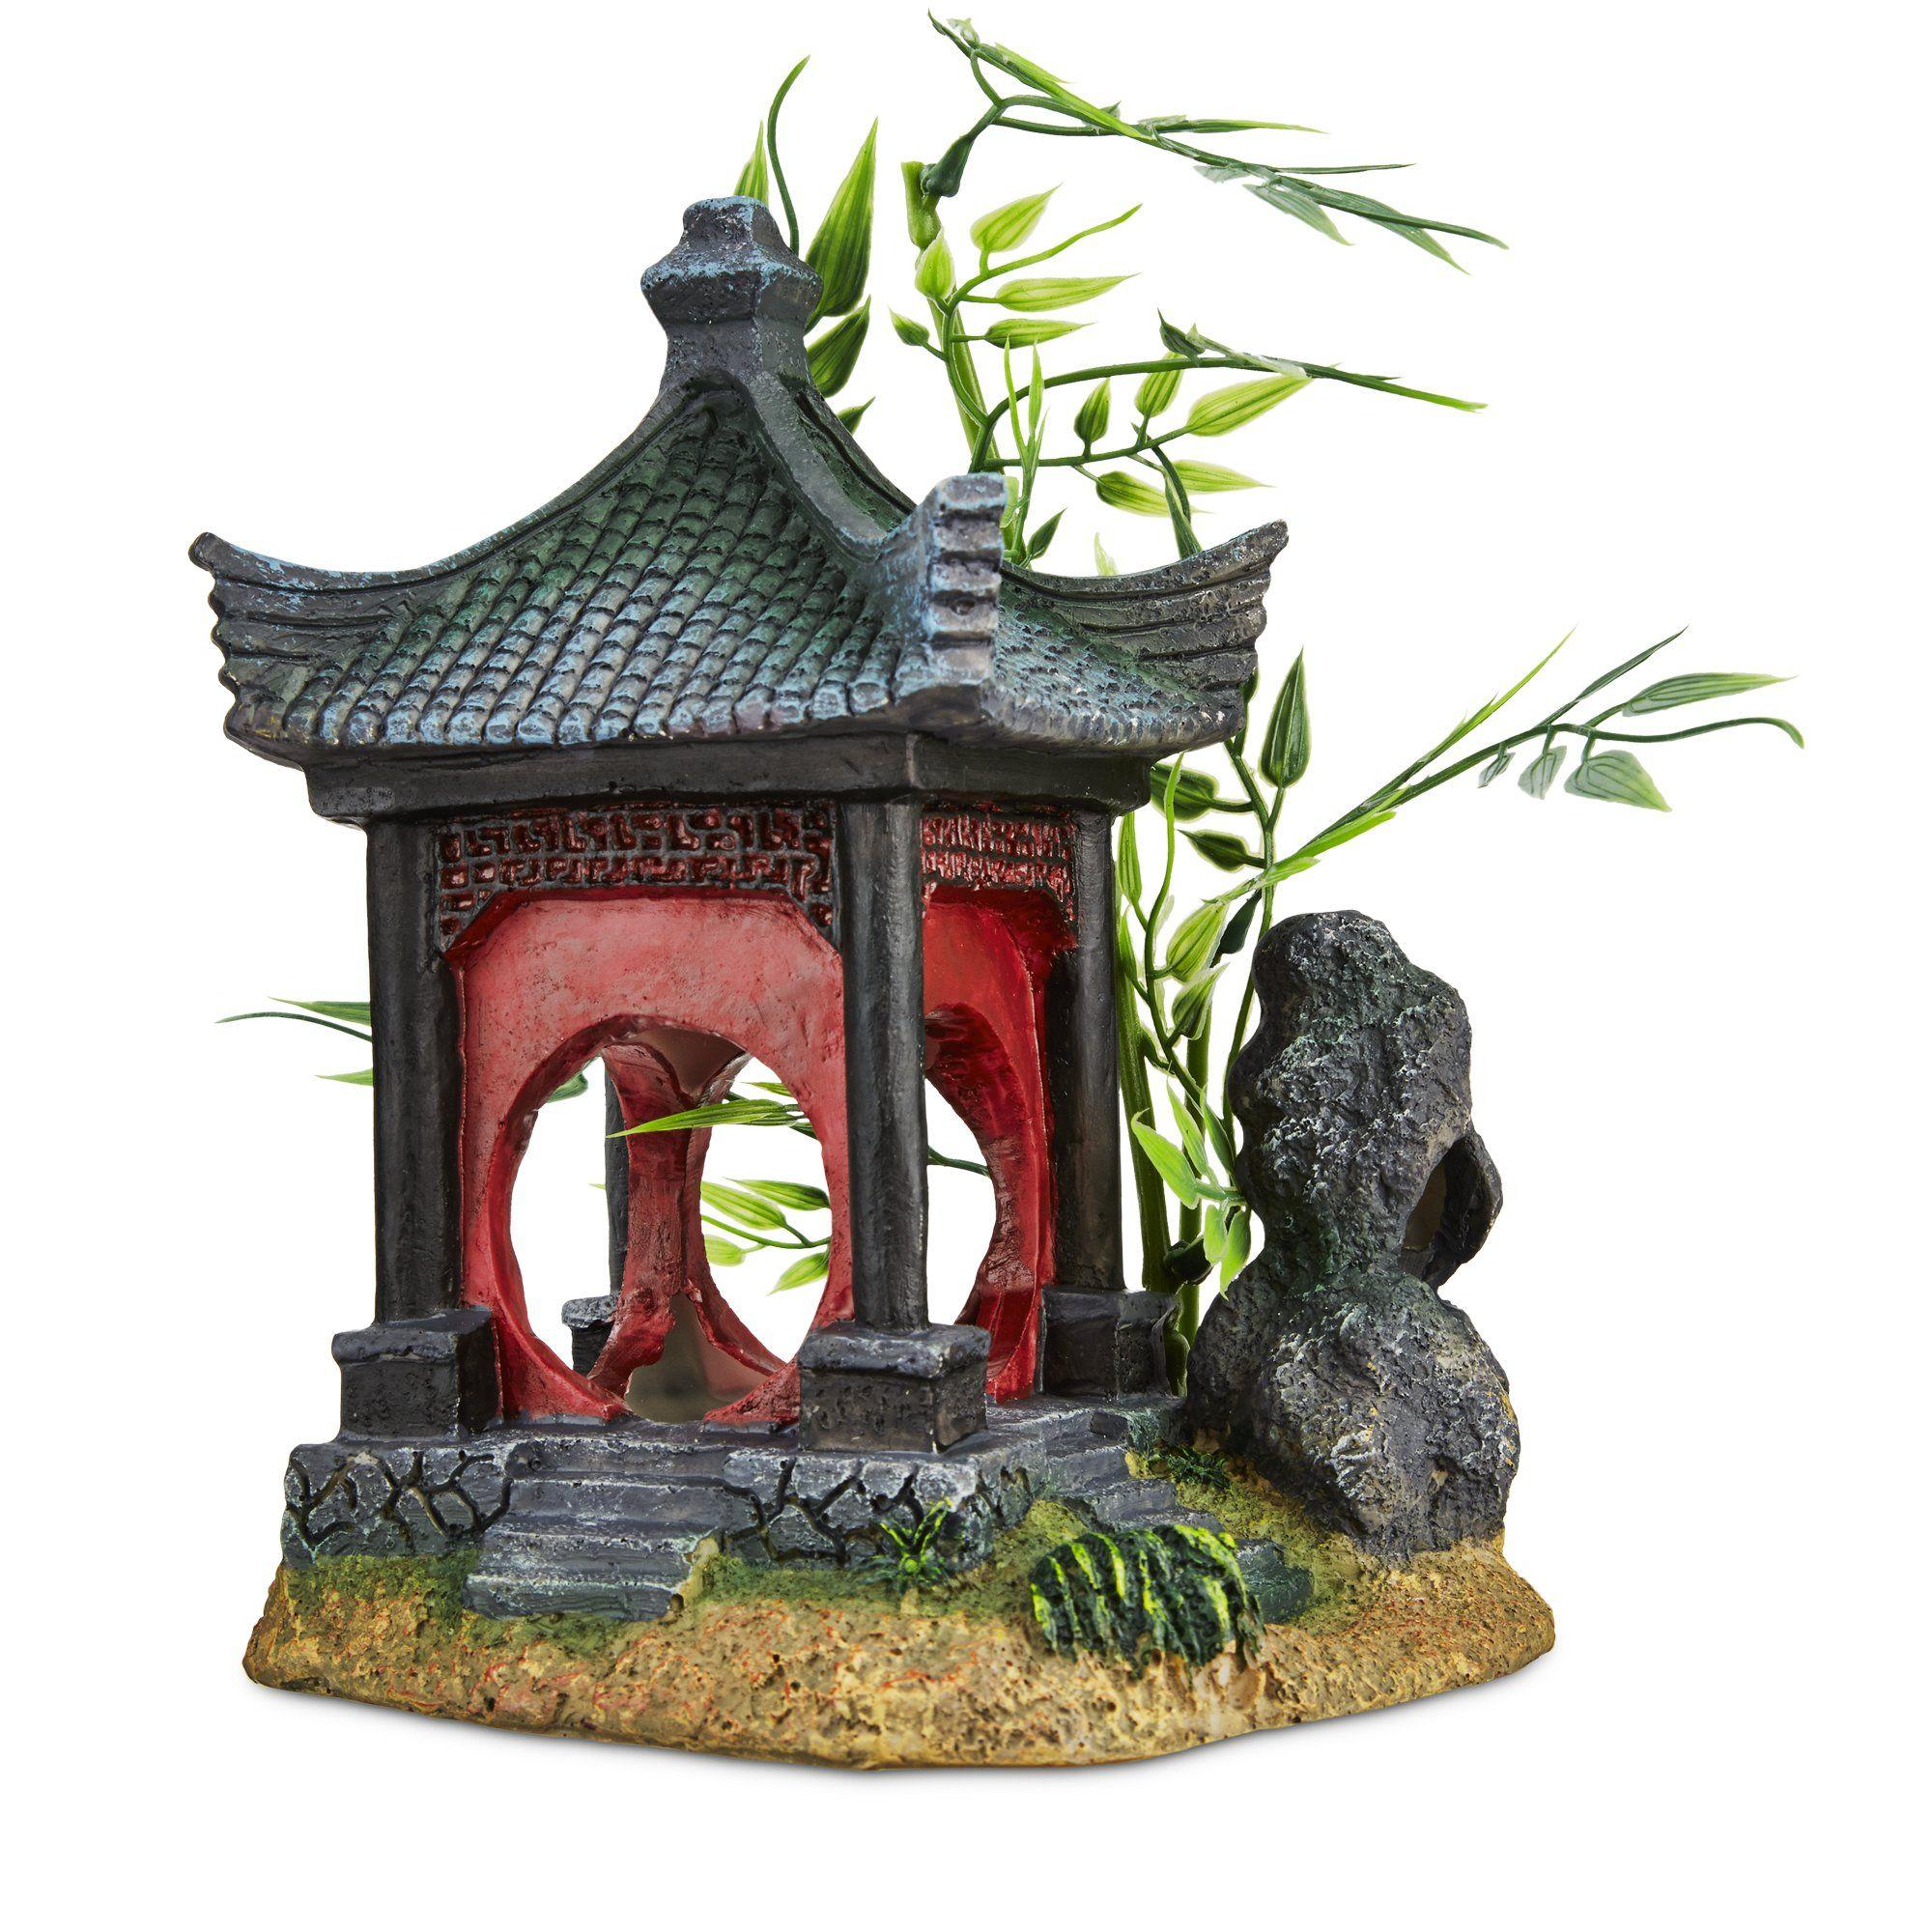 Imagitarium Asian Gazebo With Bamboo Ornament Https Www Petco Com Shop En Petcostore Product Imagitarium As Fish Tank Decorations Dragon Decor Fish Tank